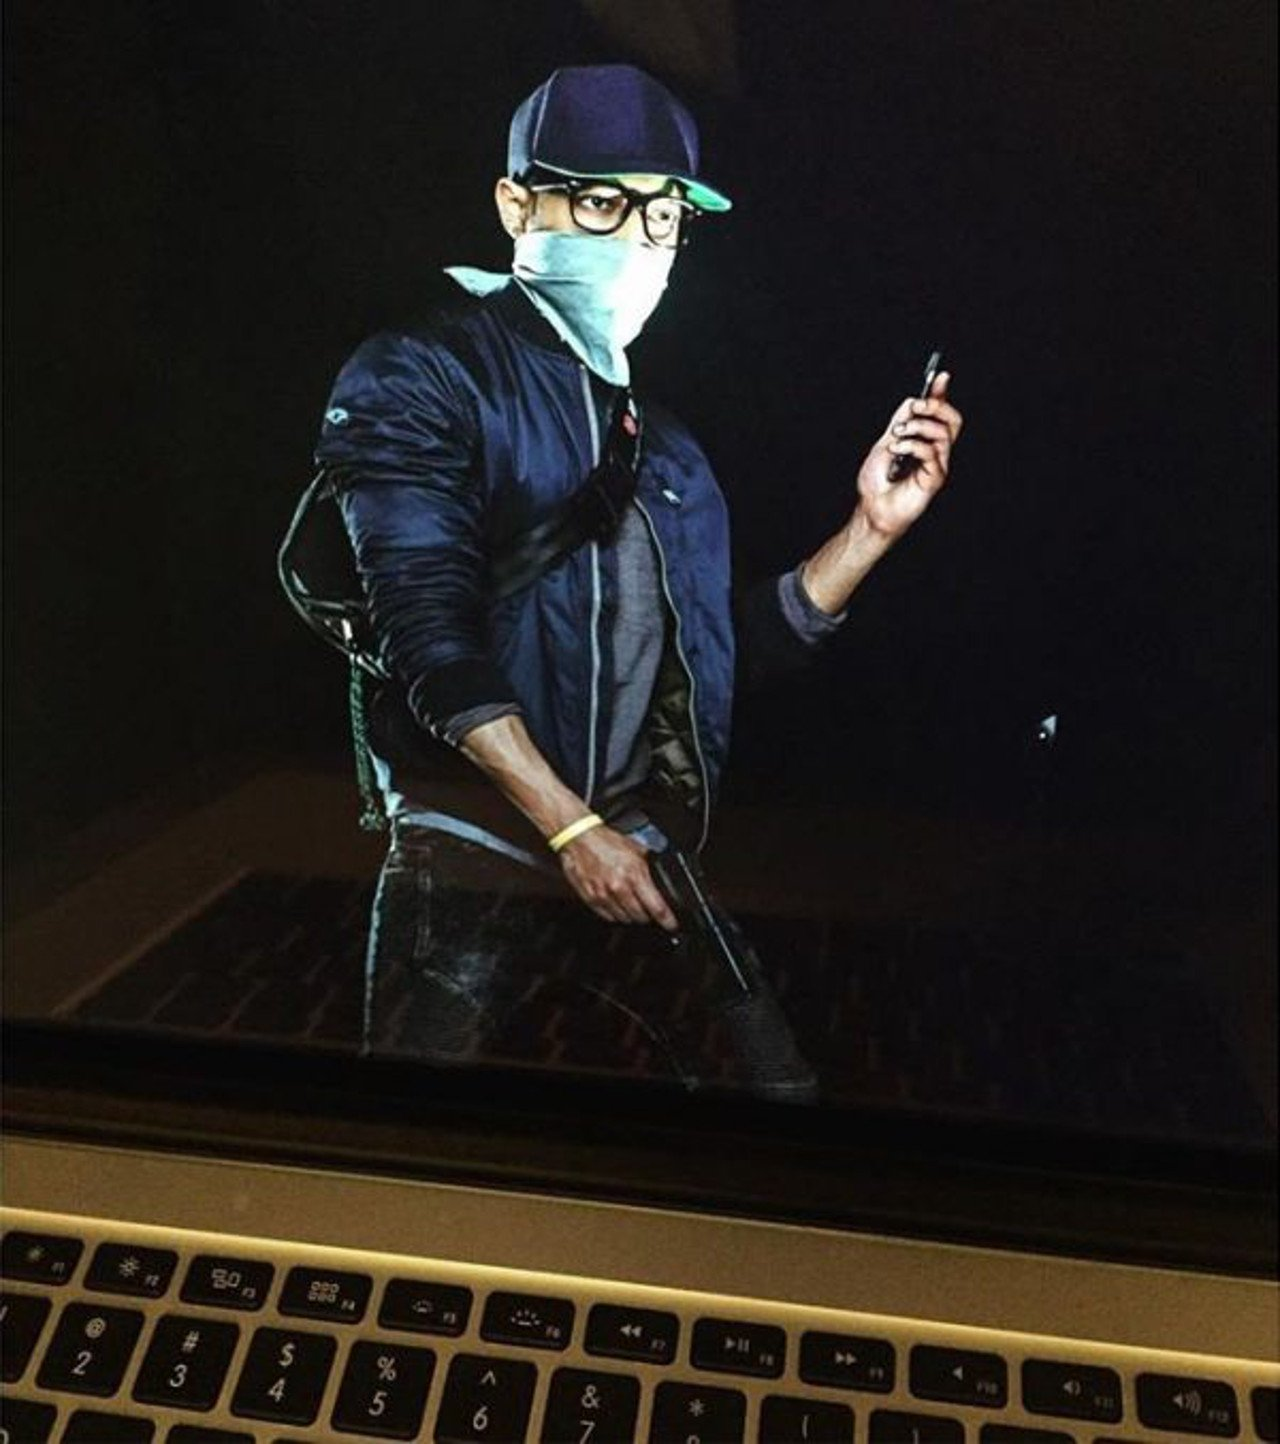 Watch Dogs 2: spunta una presunta immagine del protagonista